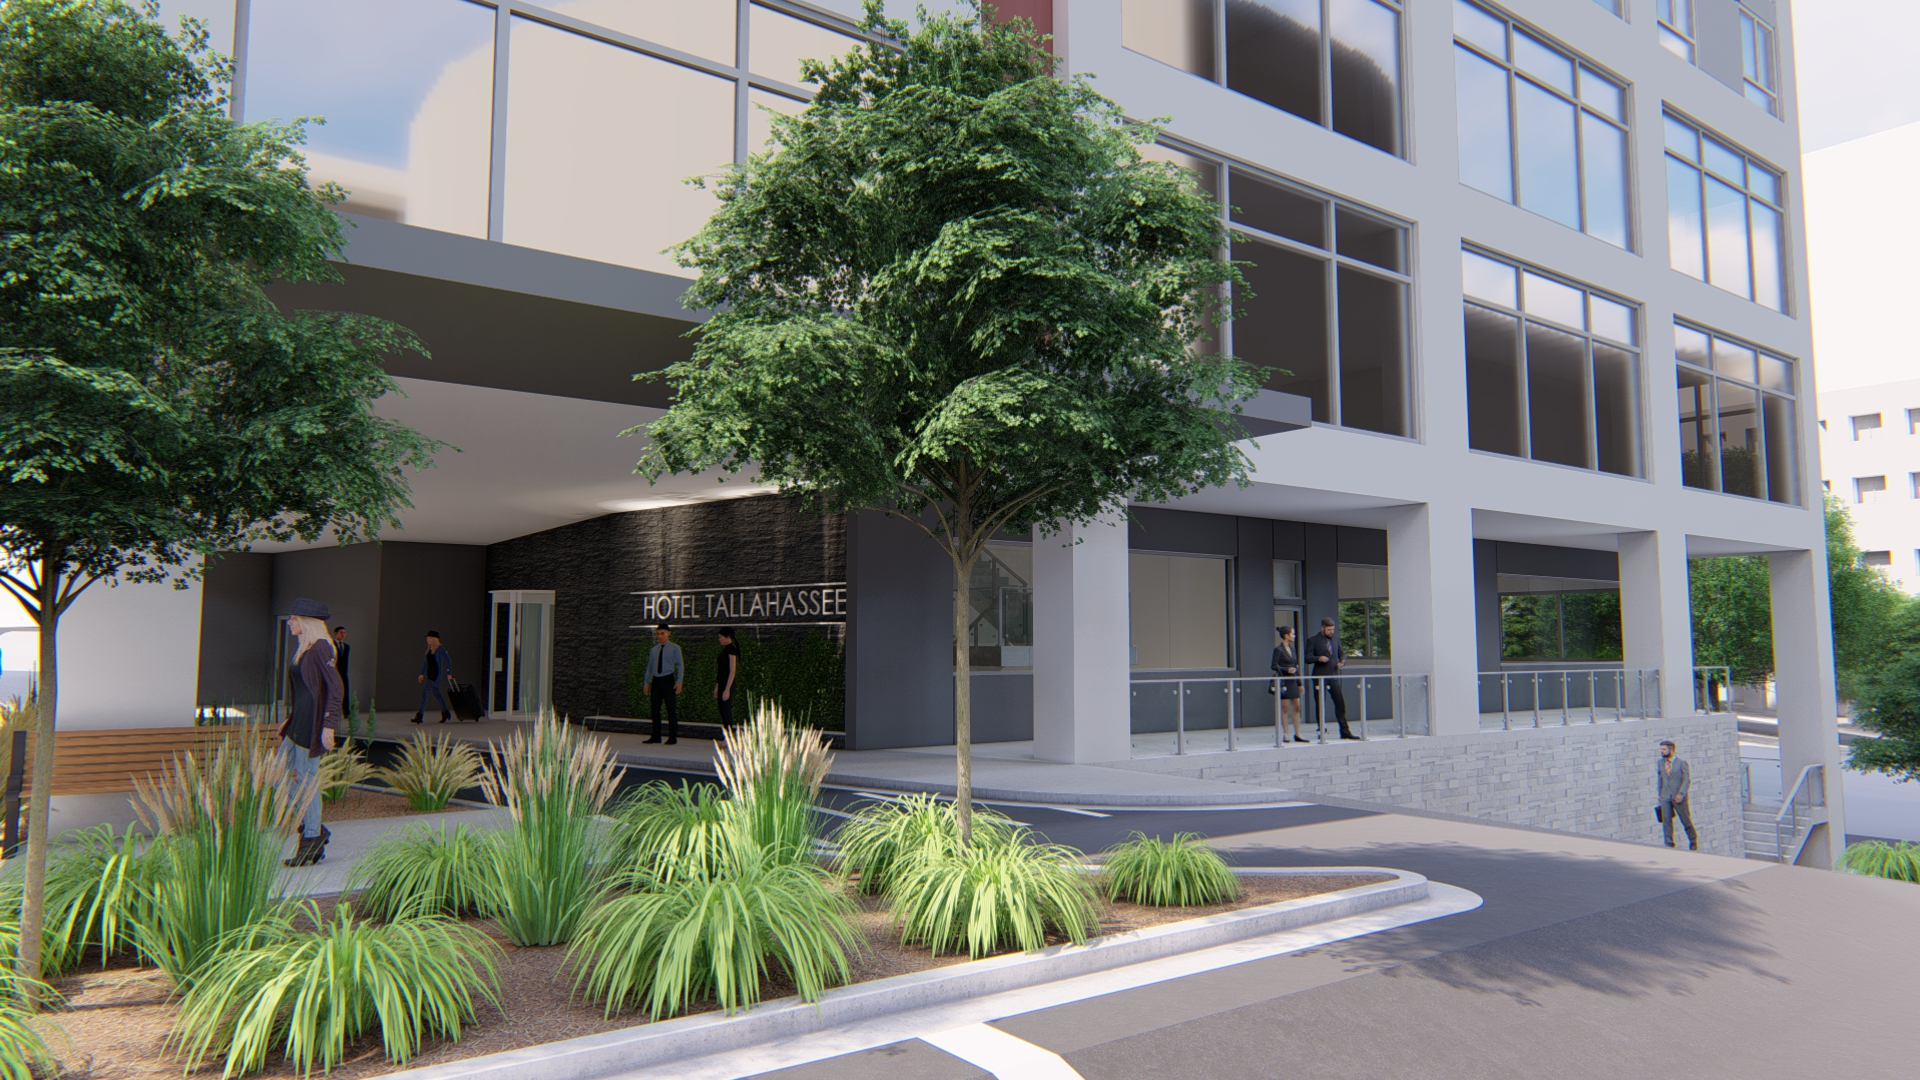 Tallahassee Hotel